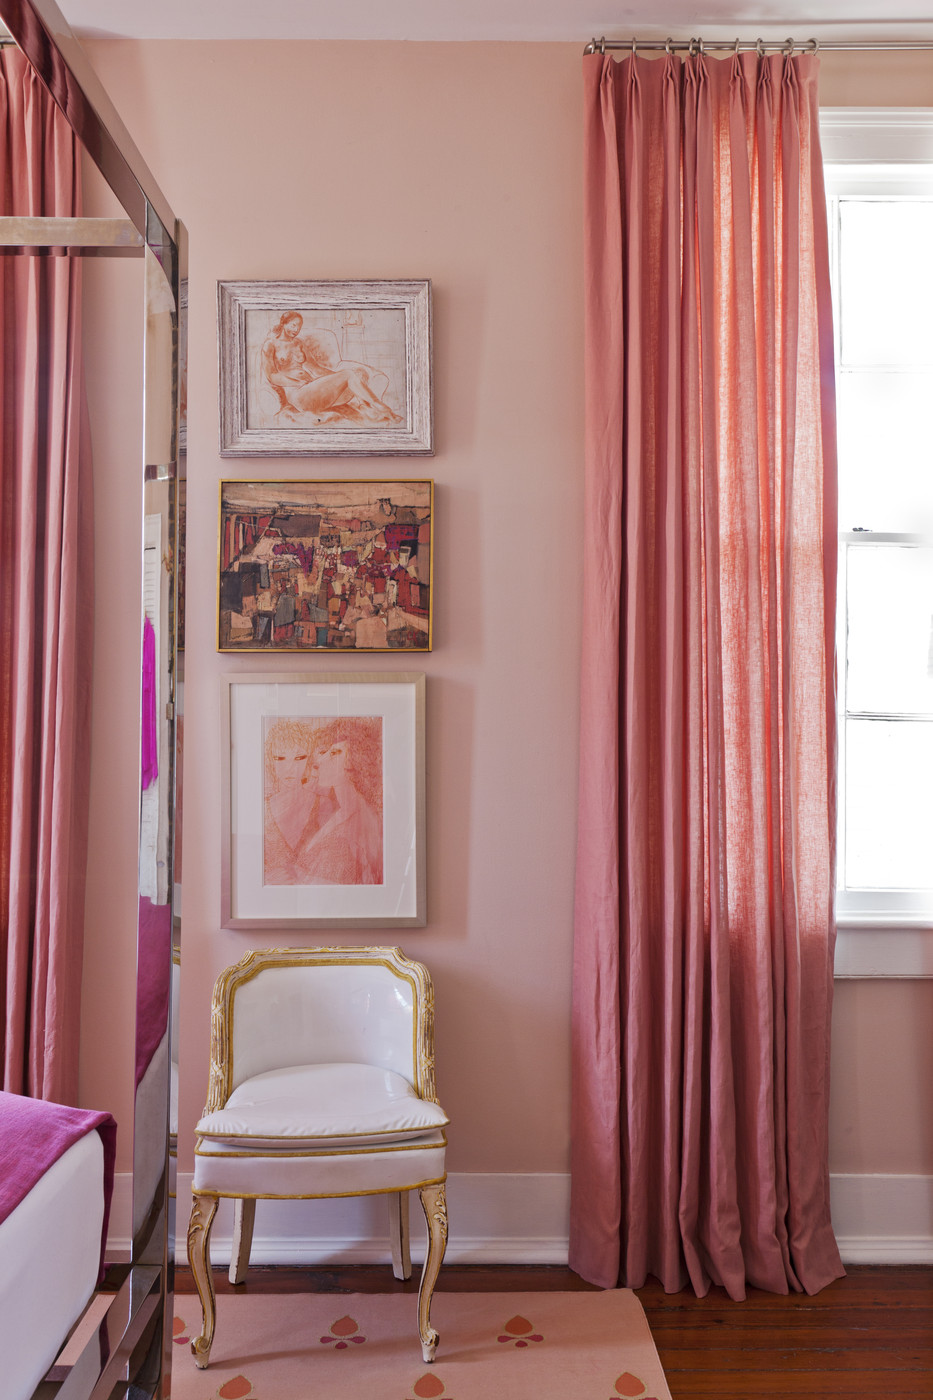 Charleston Home by Angie Hranowsky, Lonny Magazine